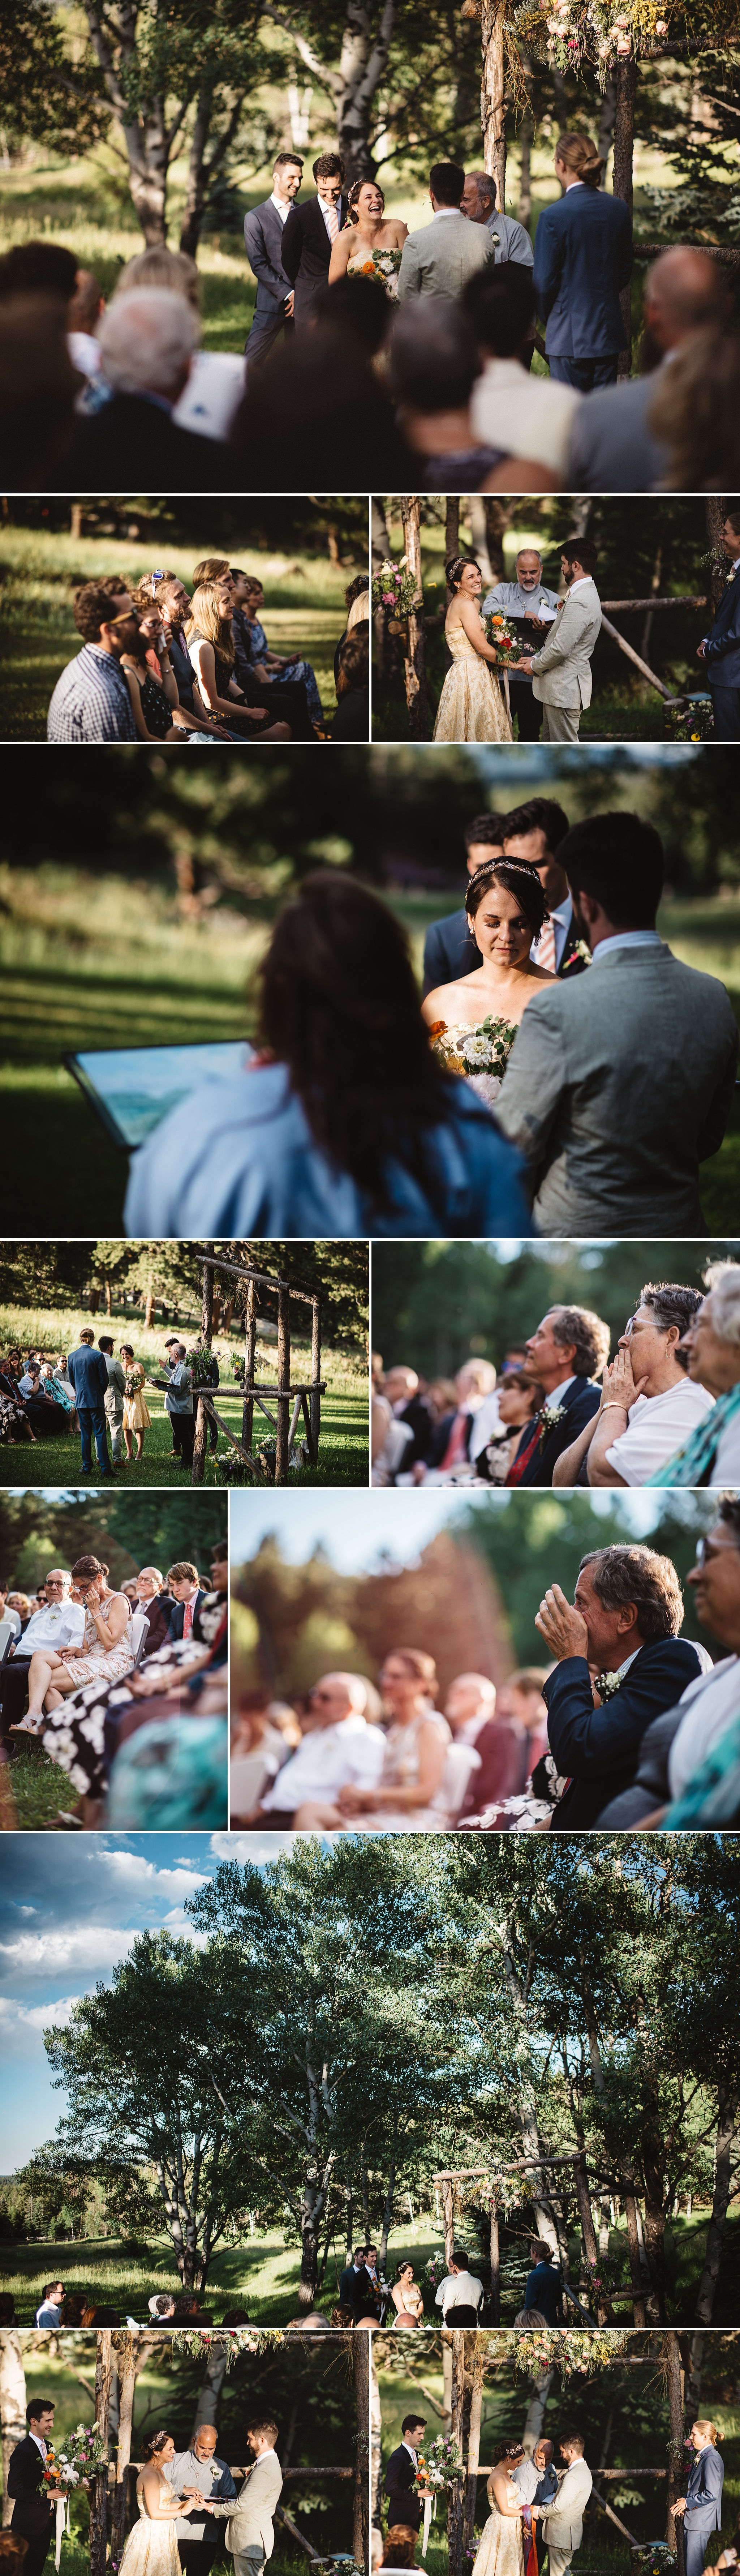 Ansley+Julian-Willow-Creek-Ceremony-012_WEB.jpg